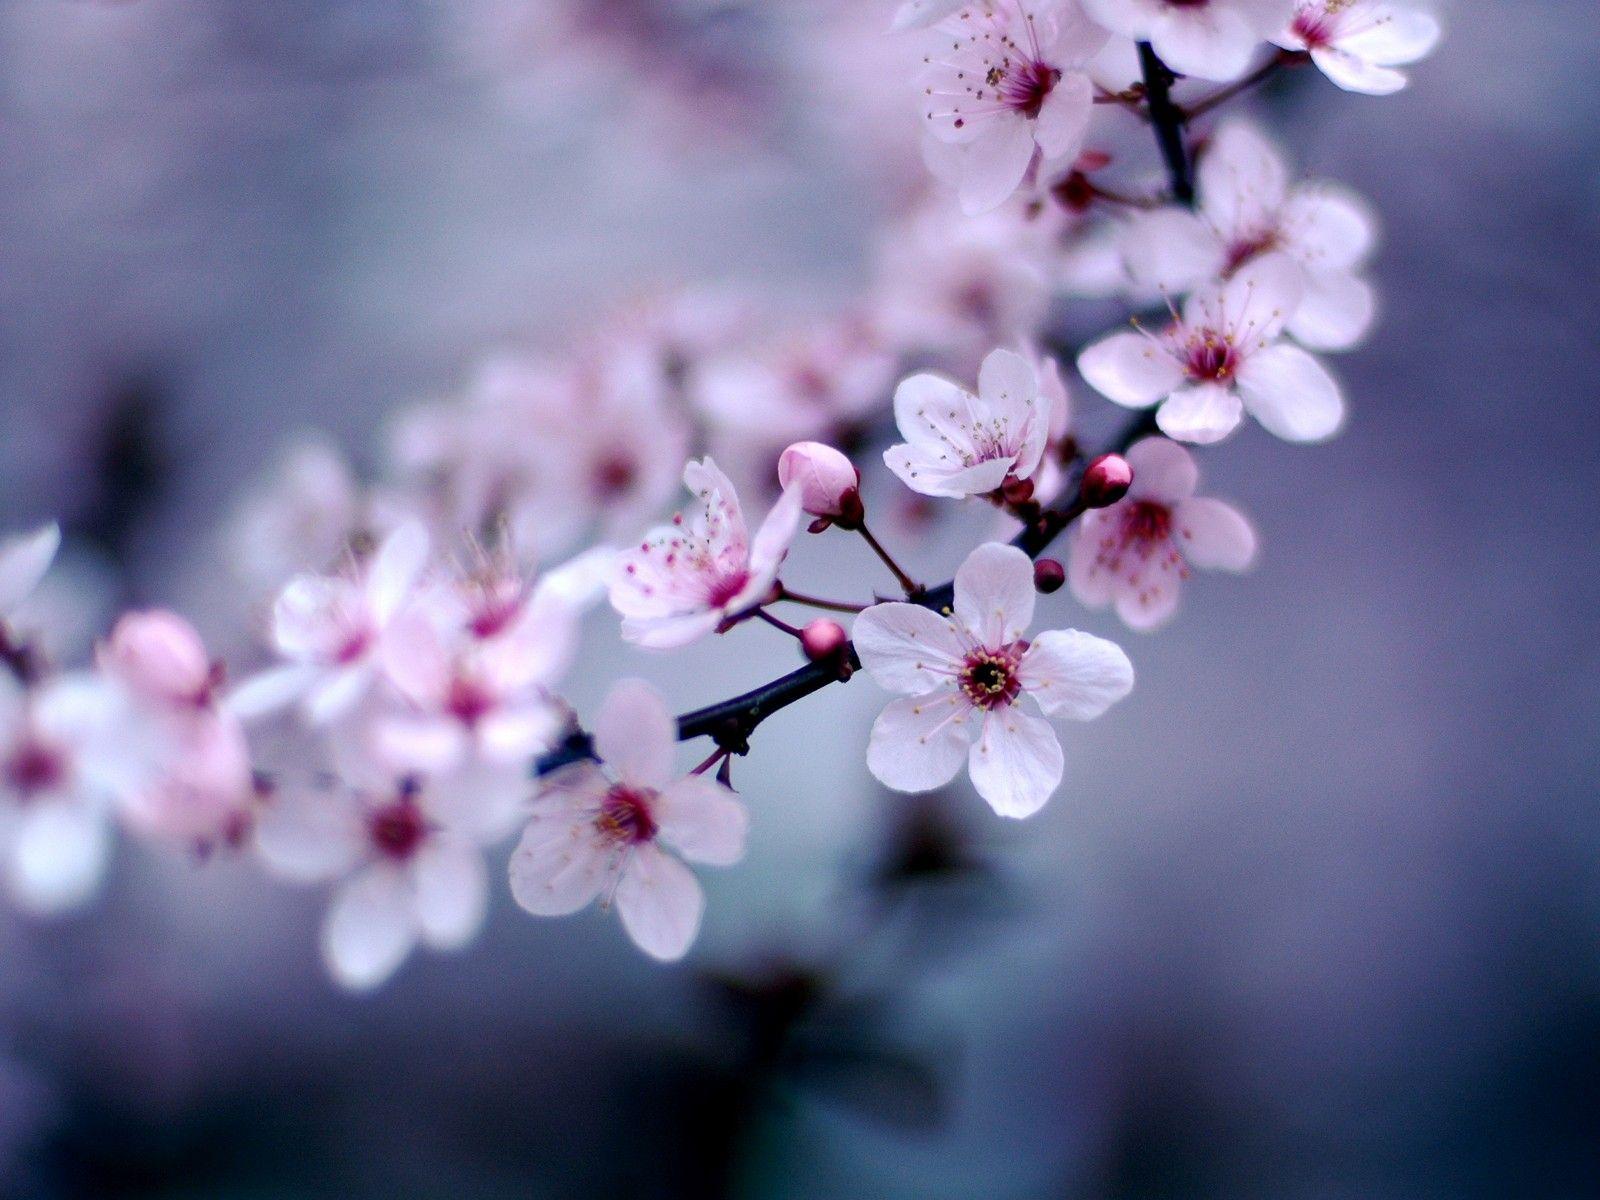 cherry-blossom_1600x12001.jpg 1,600×1,200픽셀